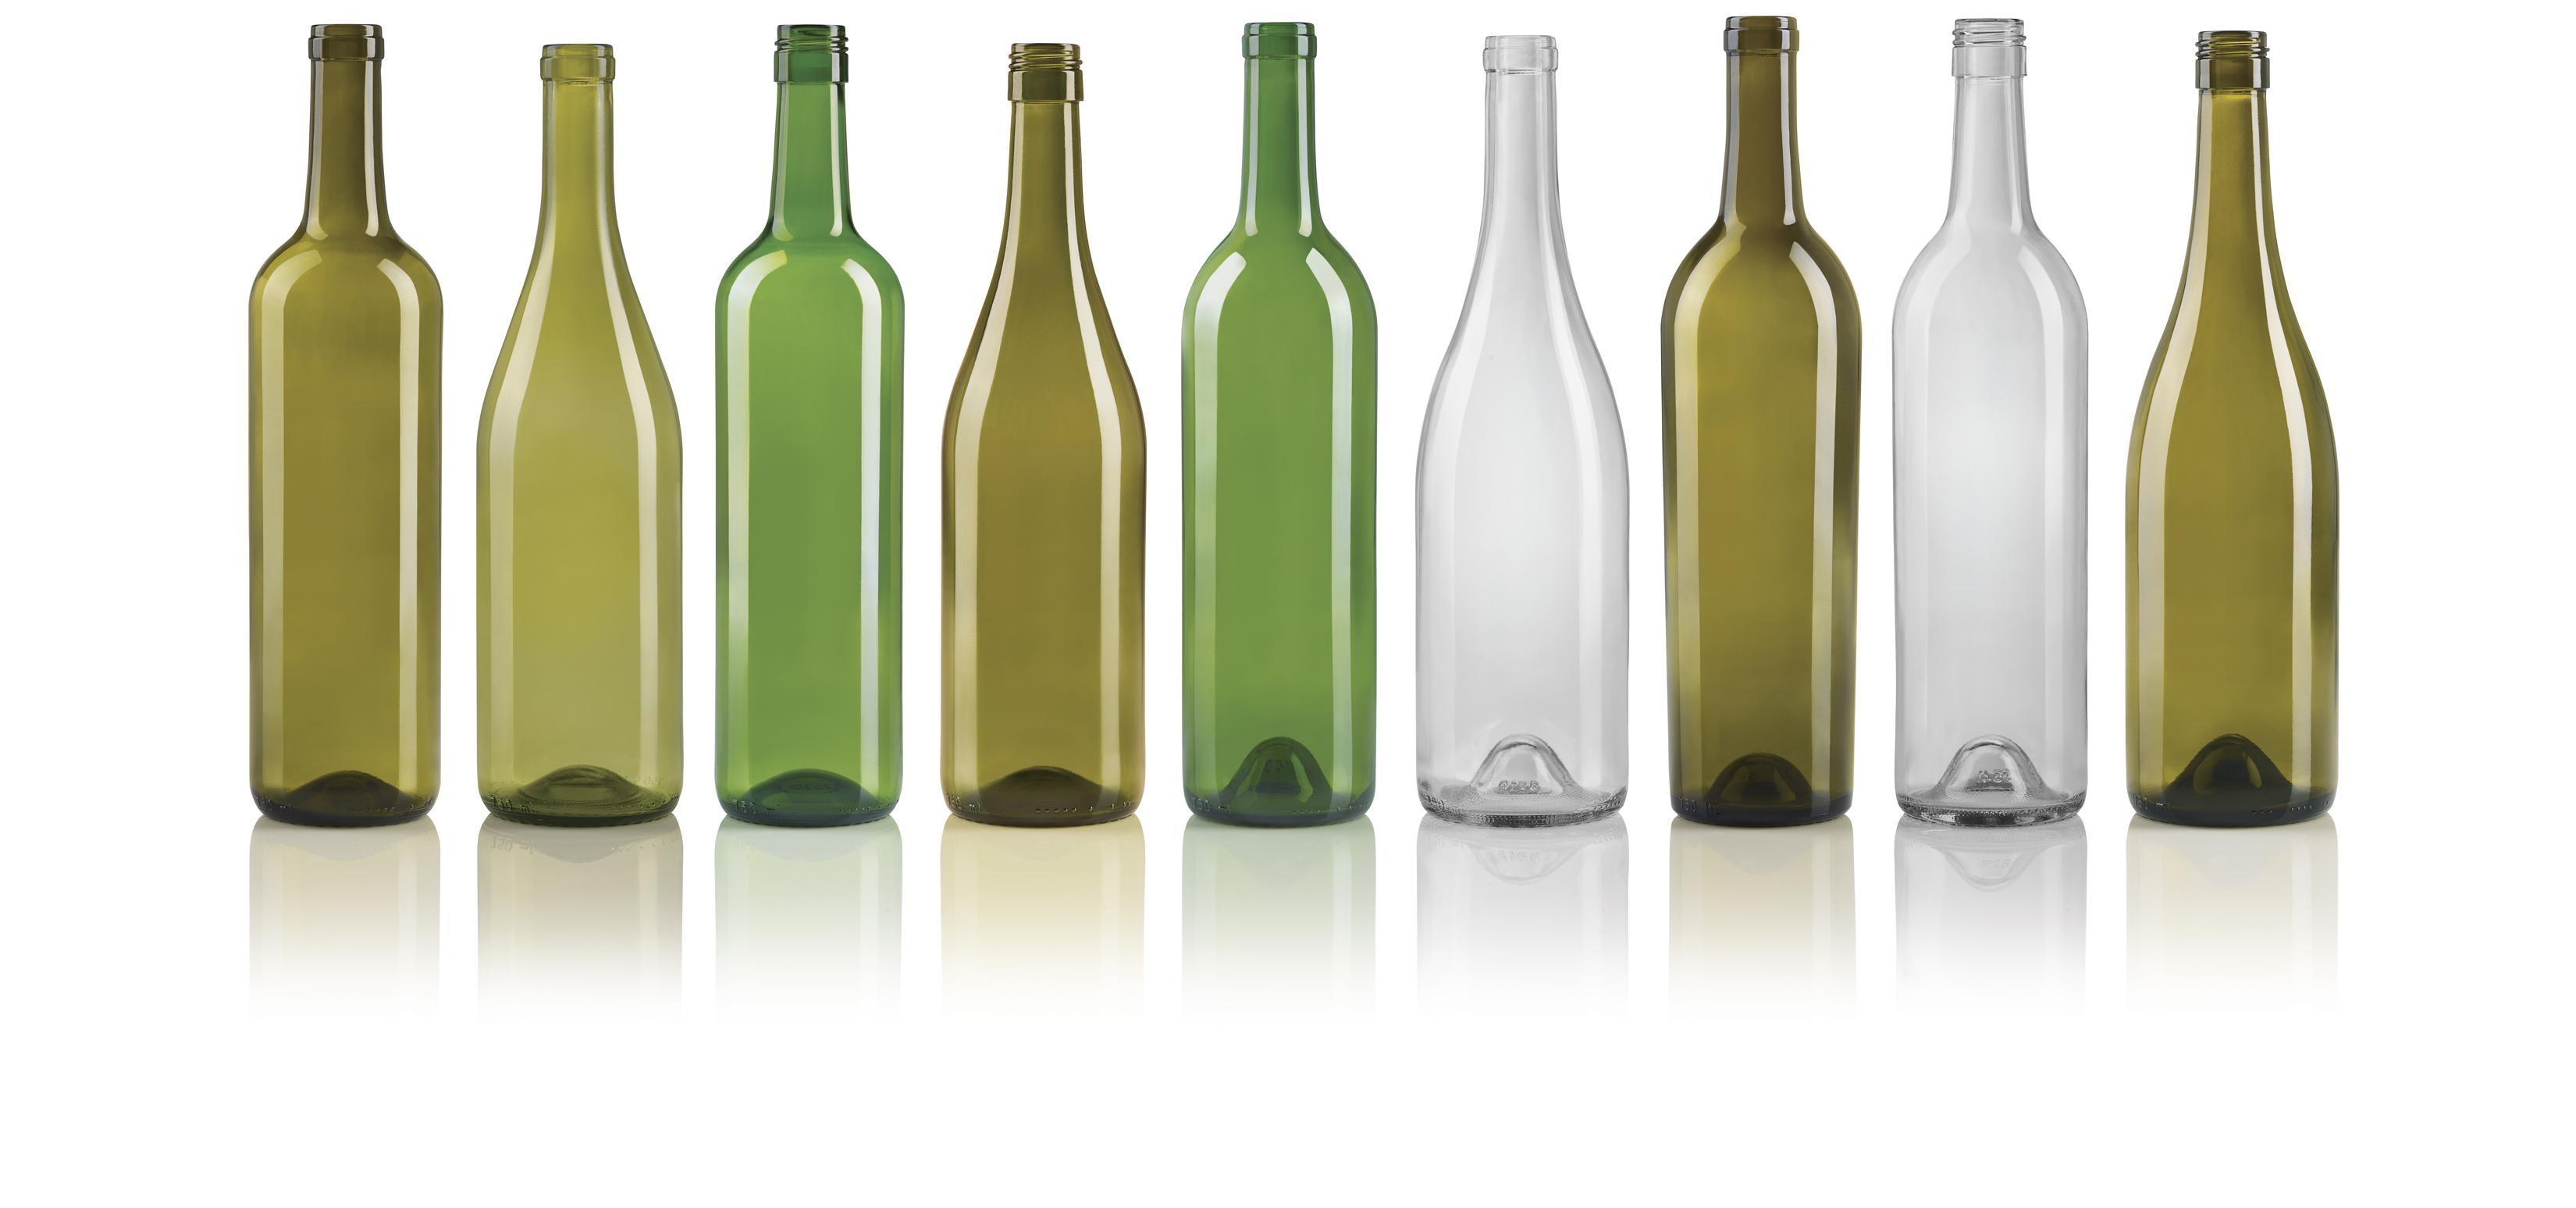 Bottles Backgrounds on Wallpapers Vista